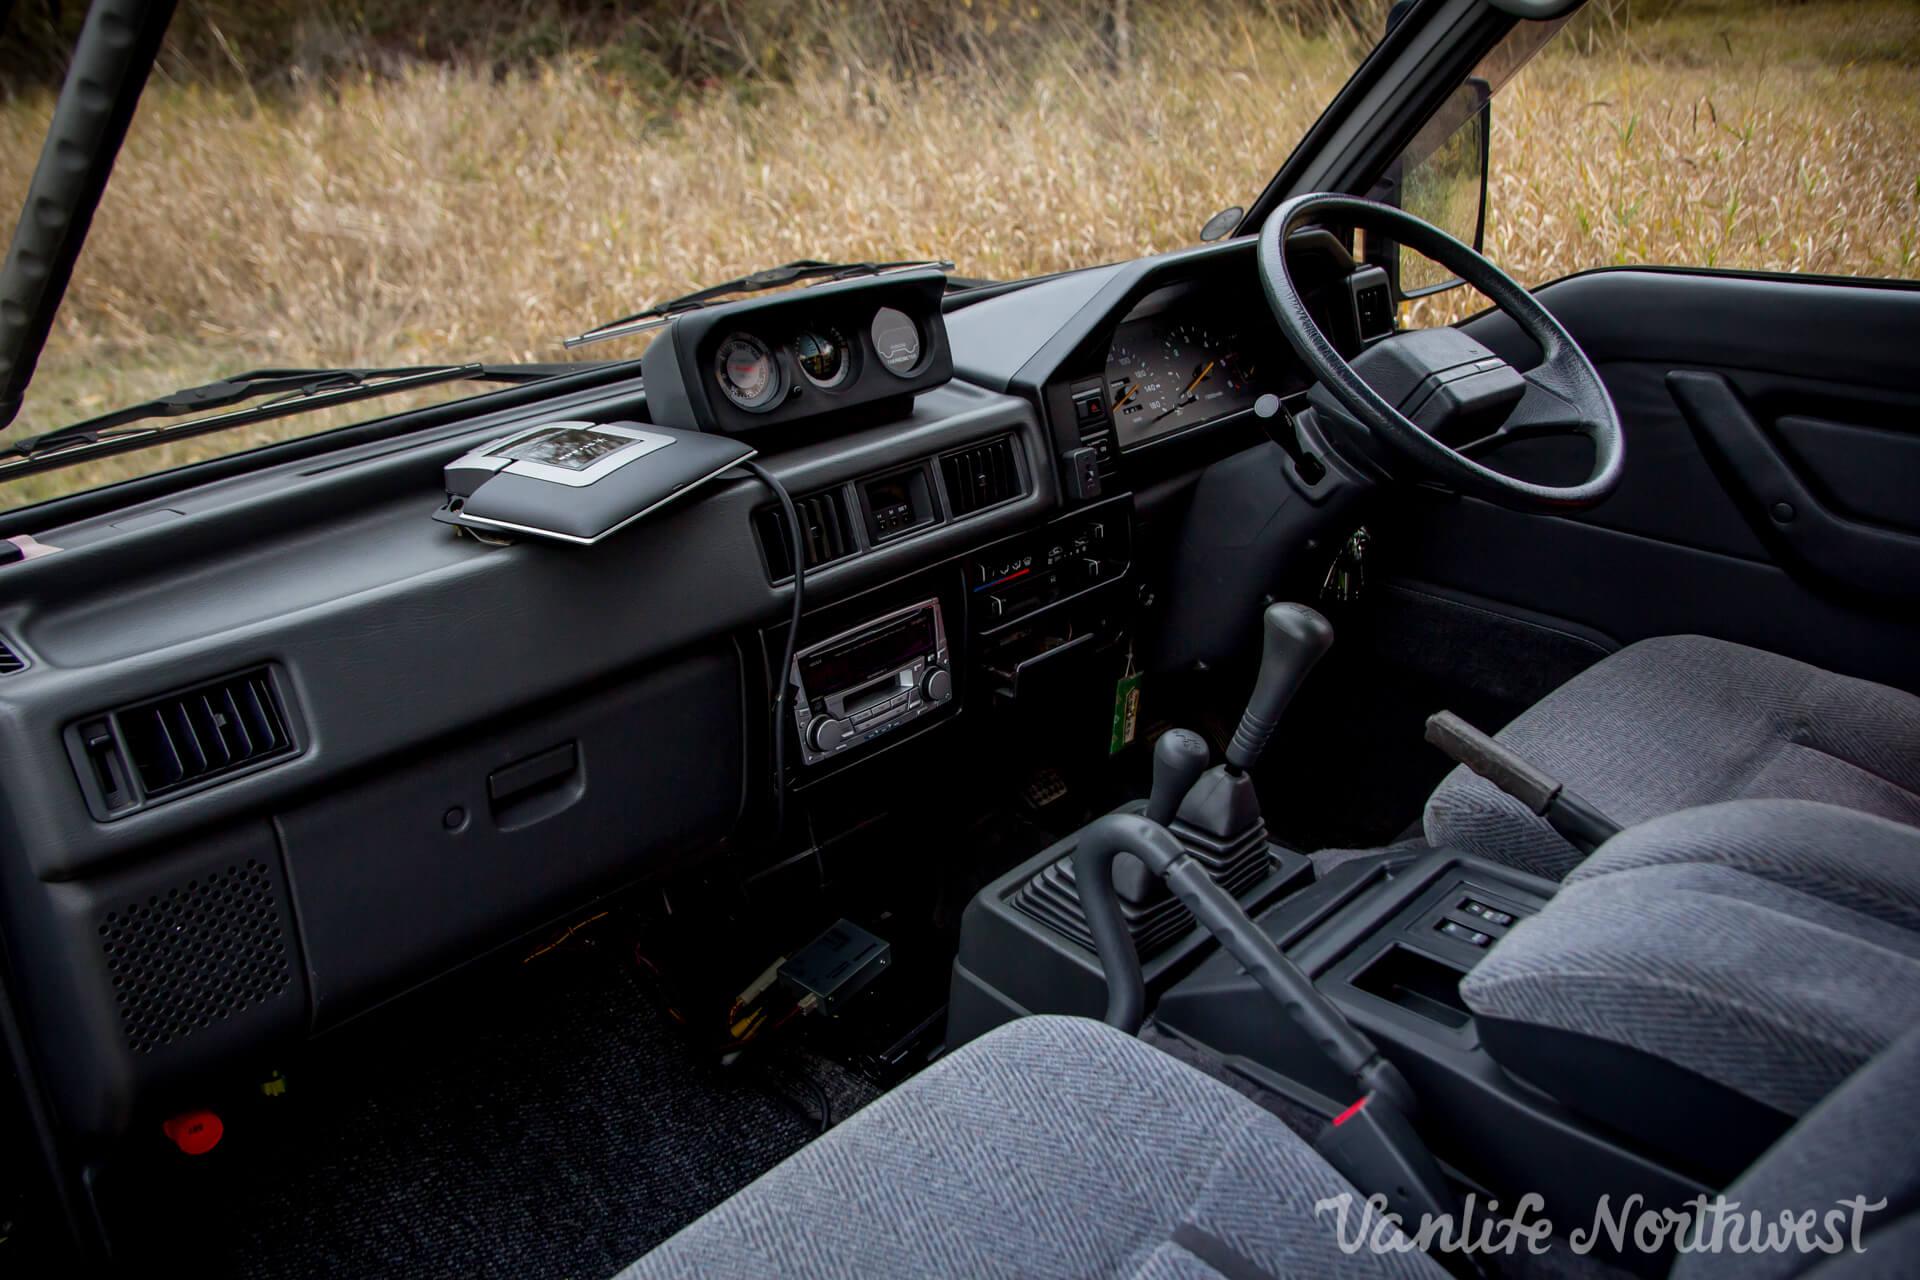 1993MitsubishiDelicaL300ExceedTimothyD-25.jpg